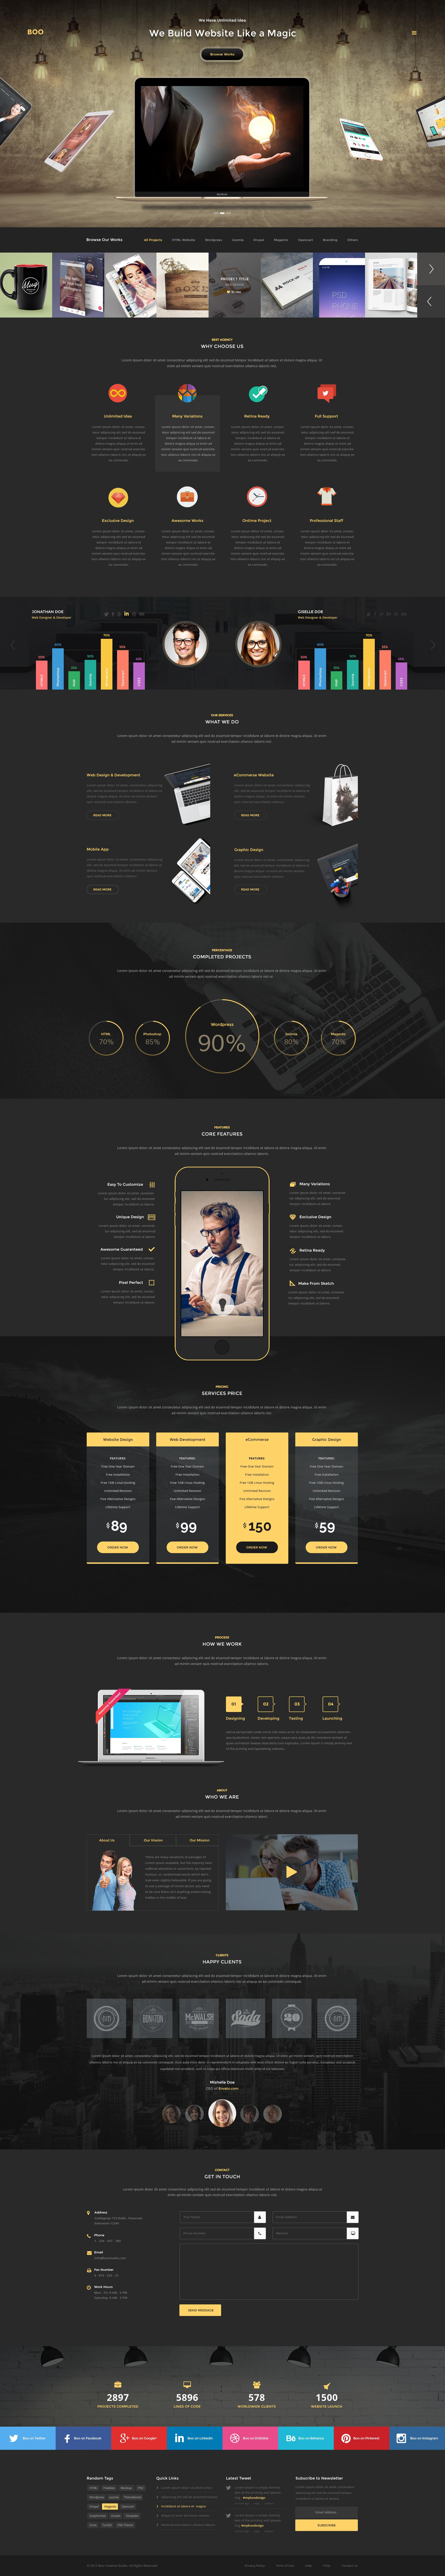 Boo | Creative - Cloud Hosting - University - eCommerce - Mobile App ...